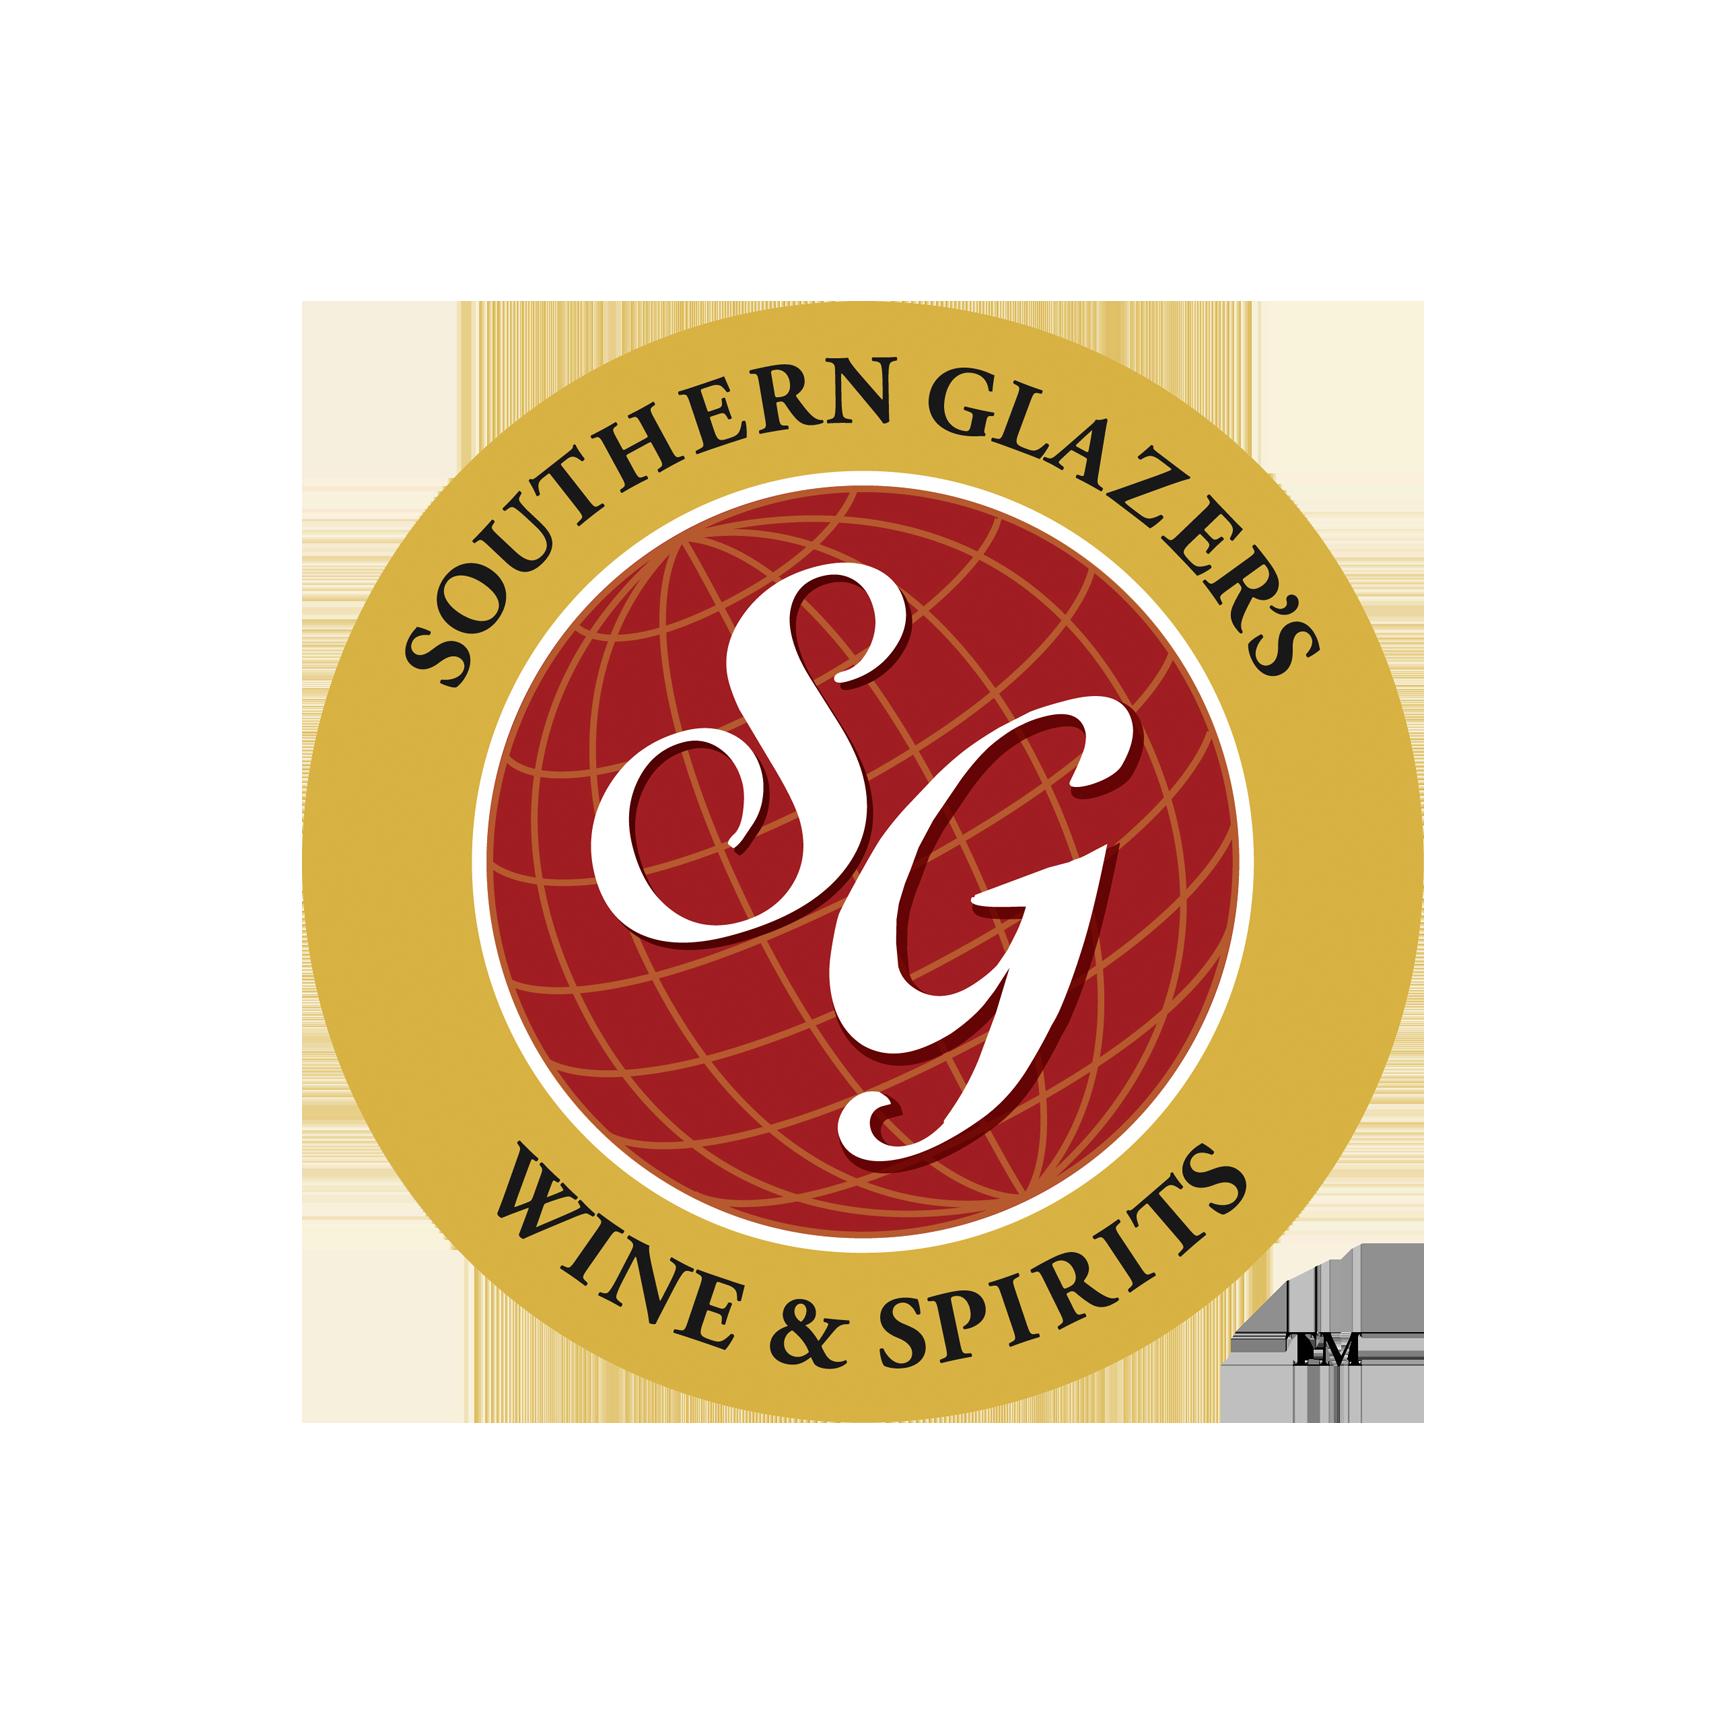 logos-SOUTHERN.png